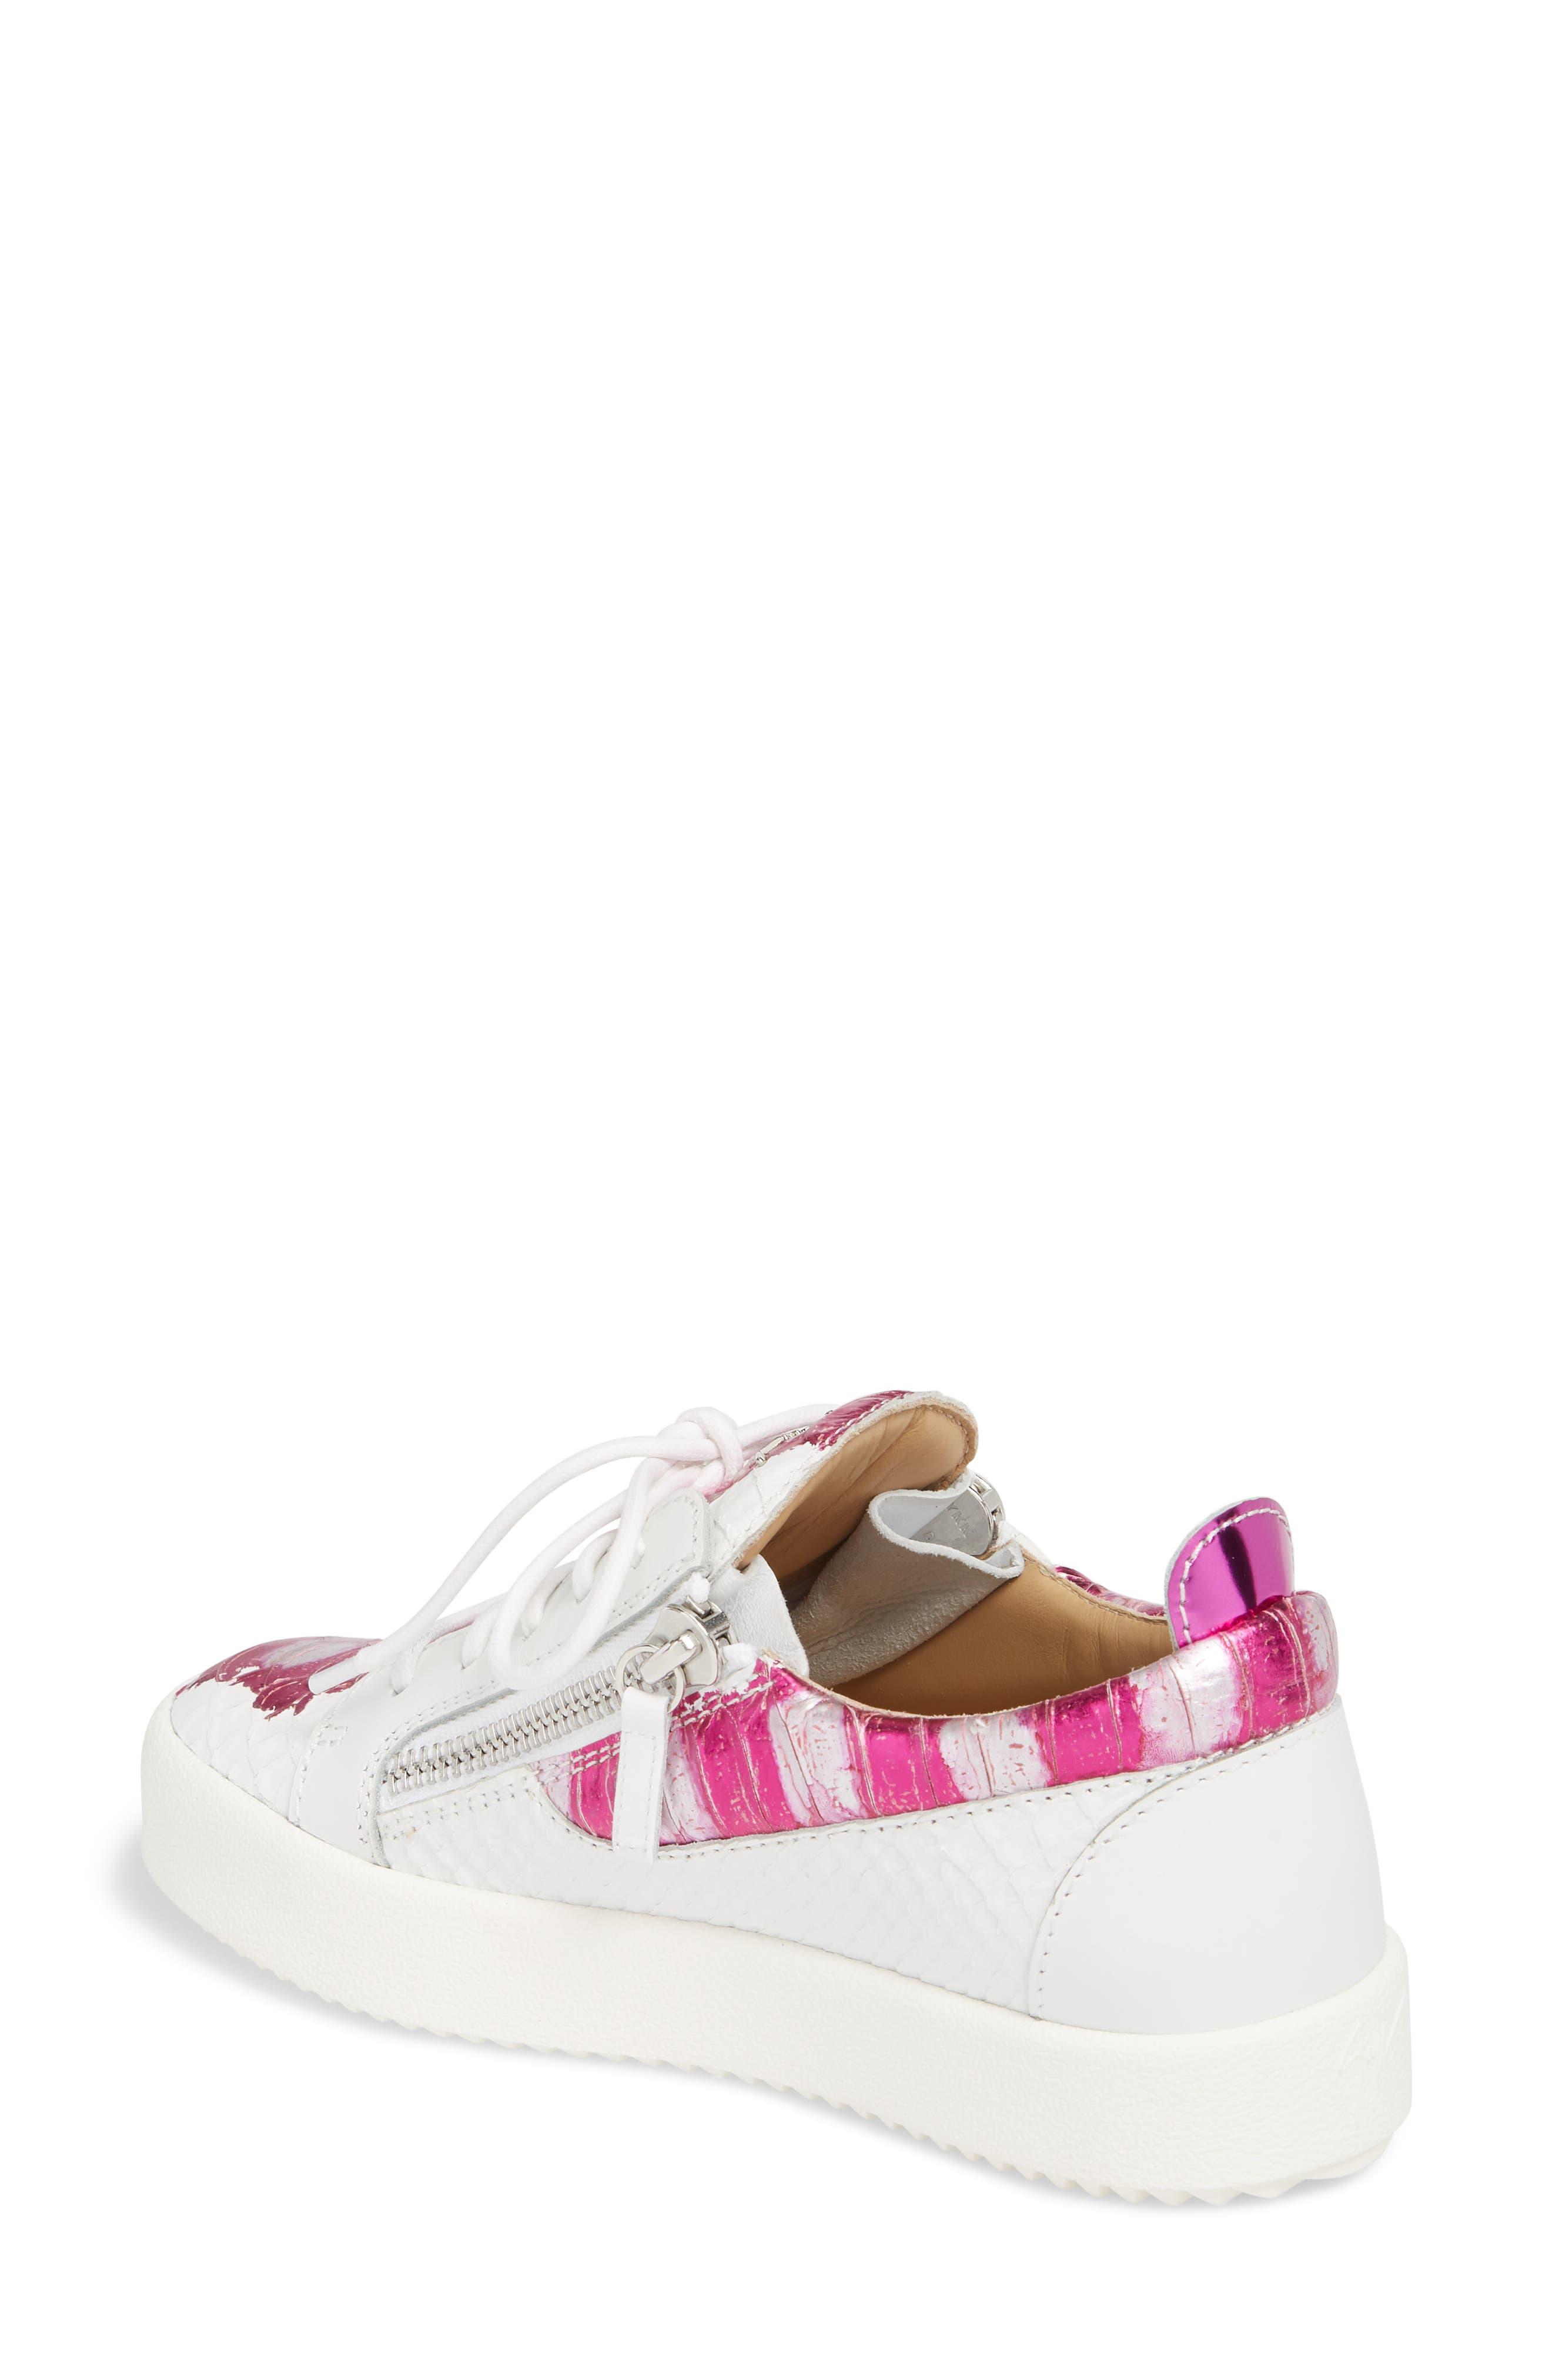 Low Top Sneaker,                             Alternate thumbnail 2, color,                             White/ Fuchsia